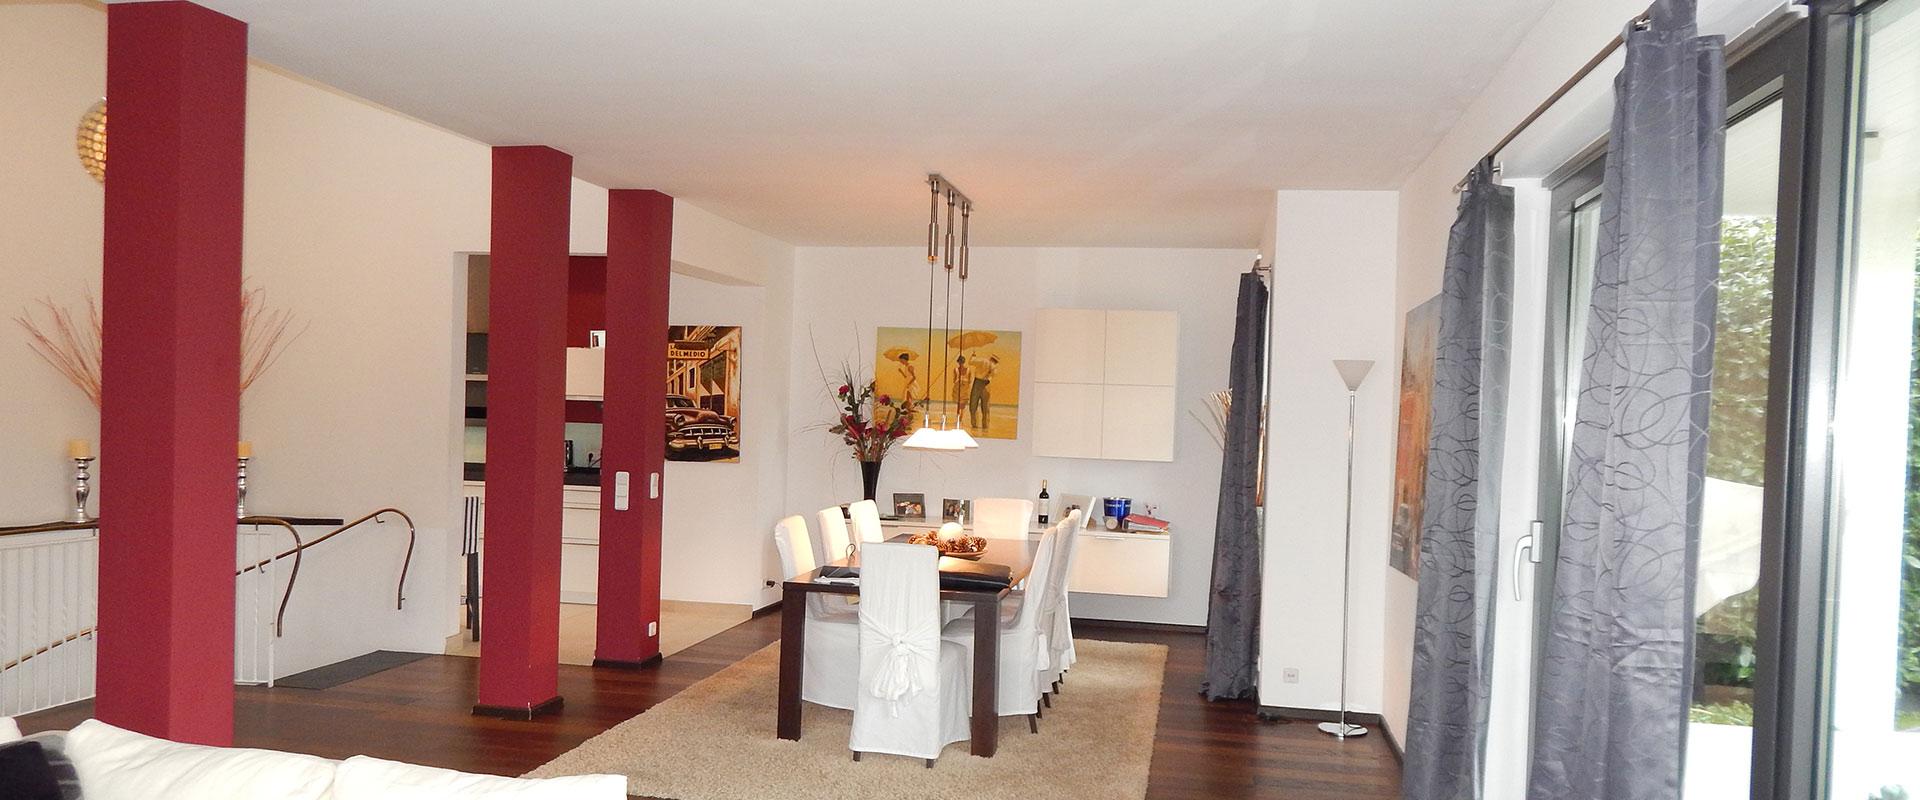 immobilien wiesbaden immobilienmarkt immobilien angebote immobilien kaufen mieten verkaufen. Black Bedroom Furniture Sets. Home Design Ideas